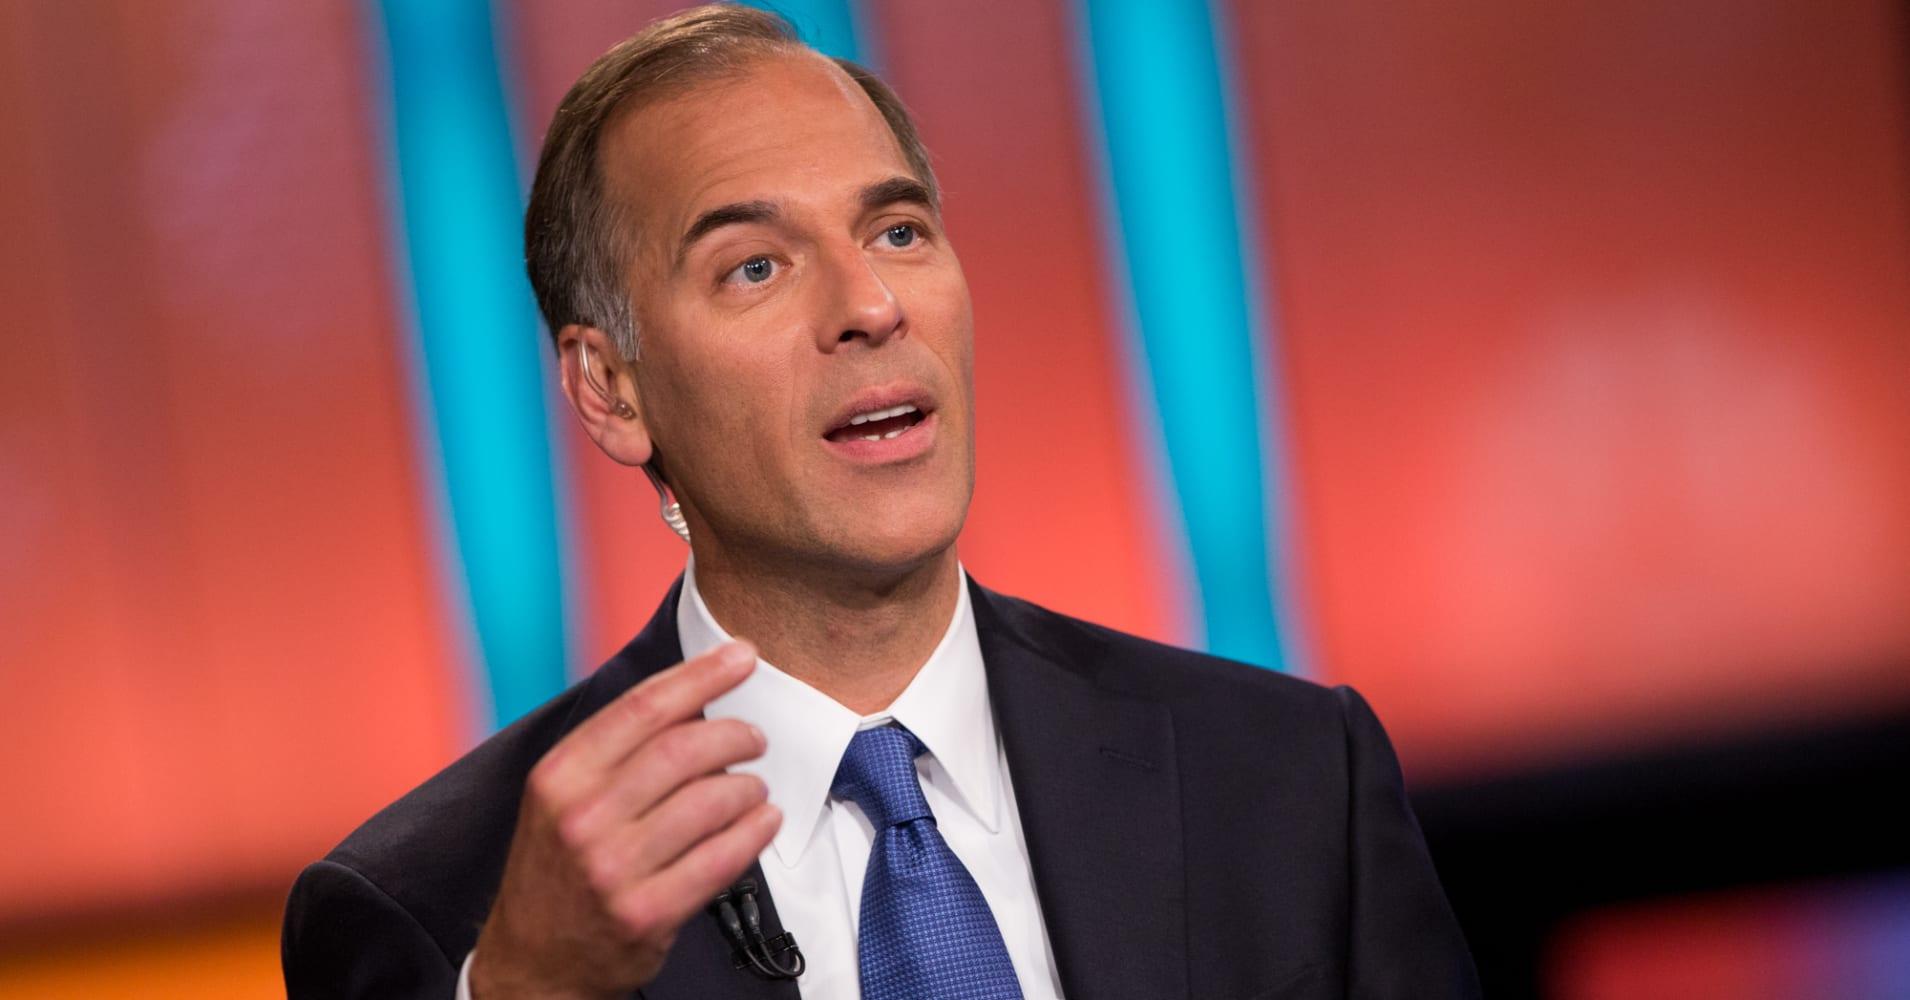 US trade war wreaks economic havoc, recession risks high